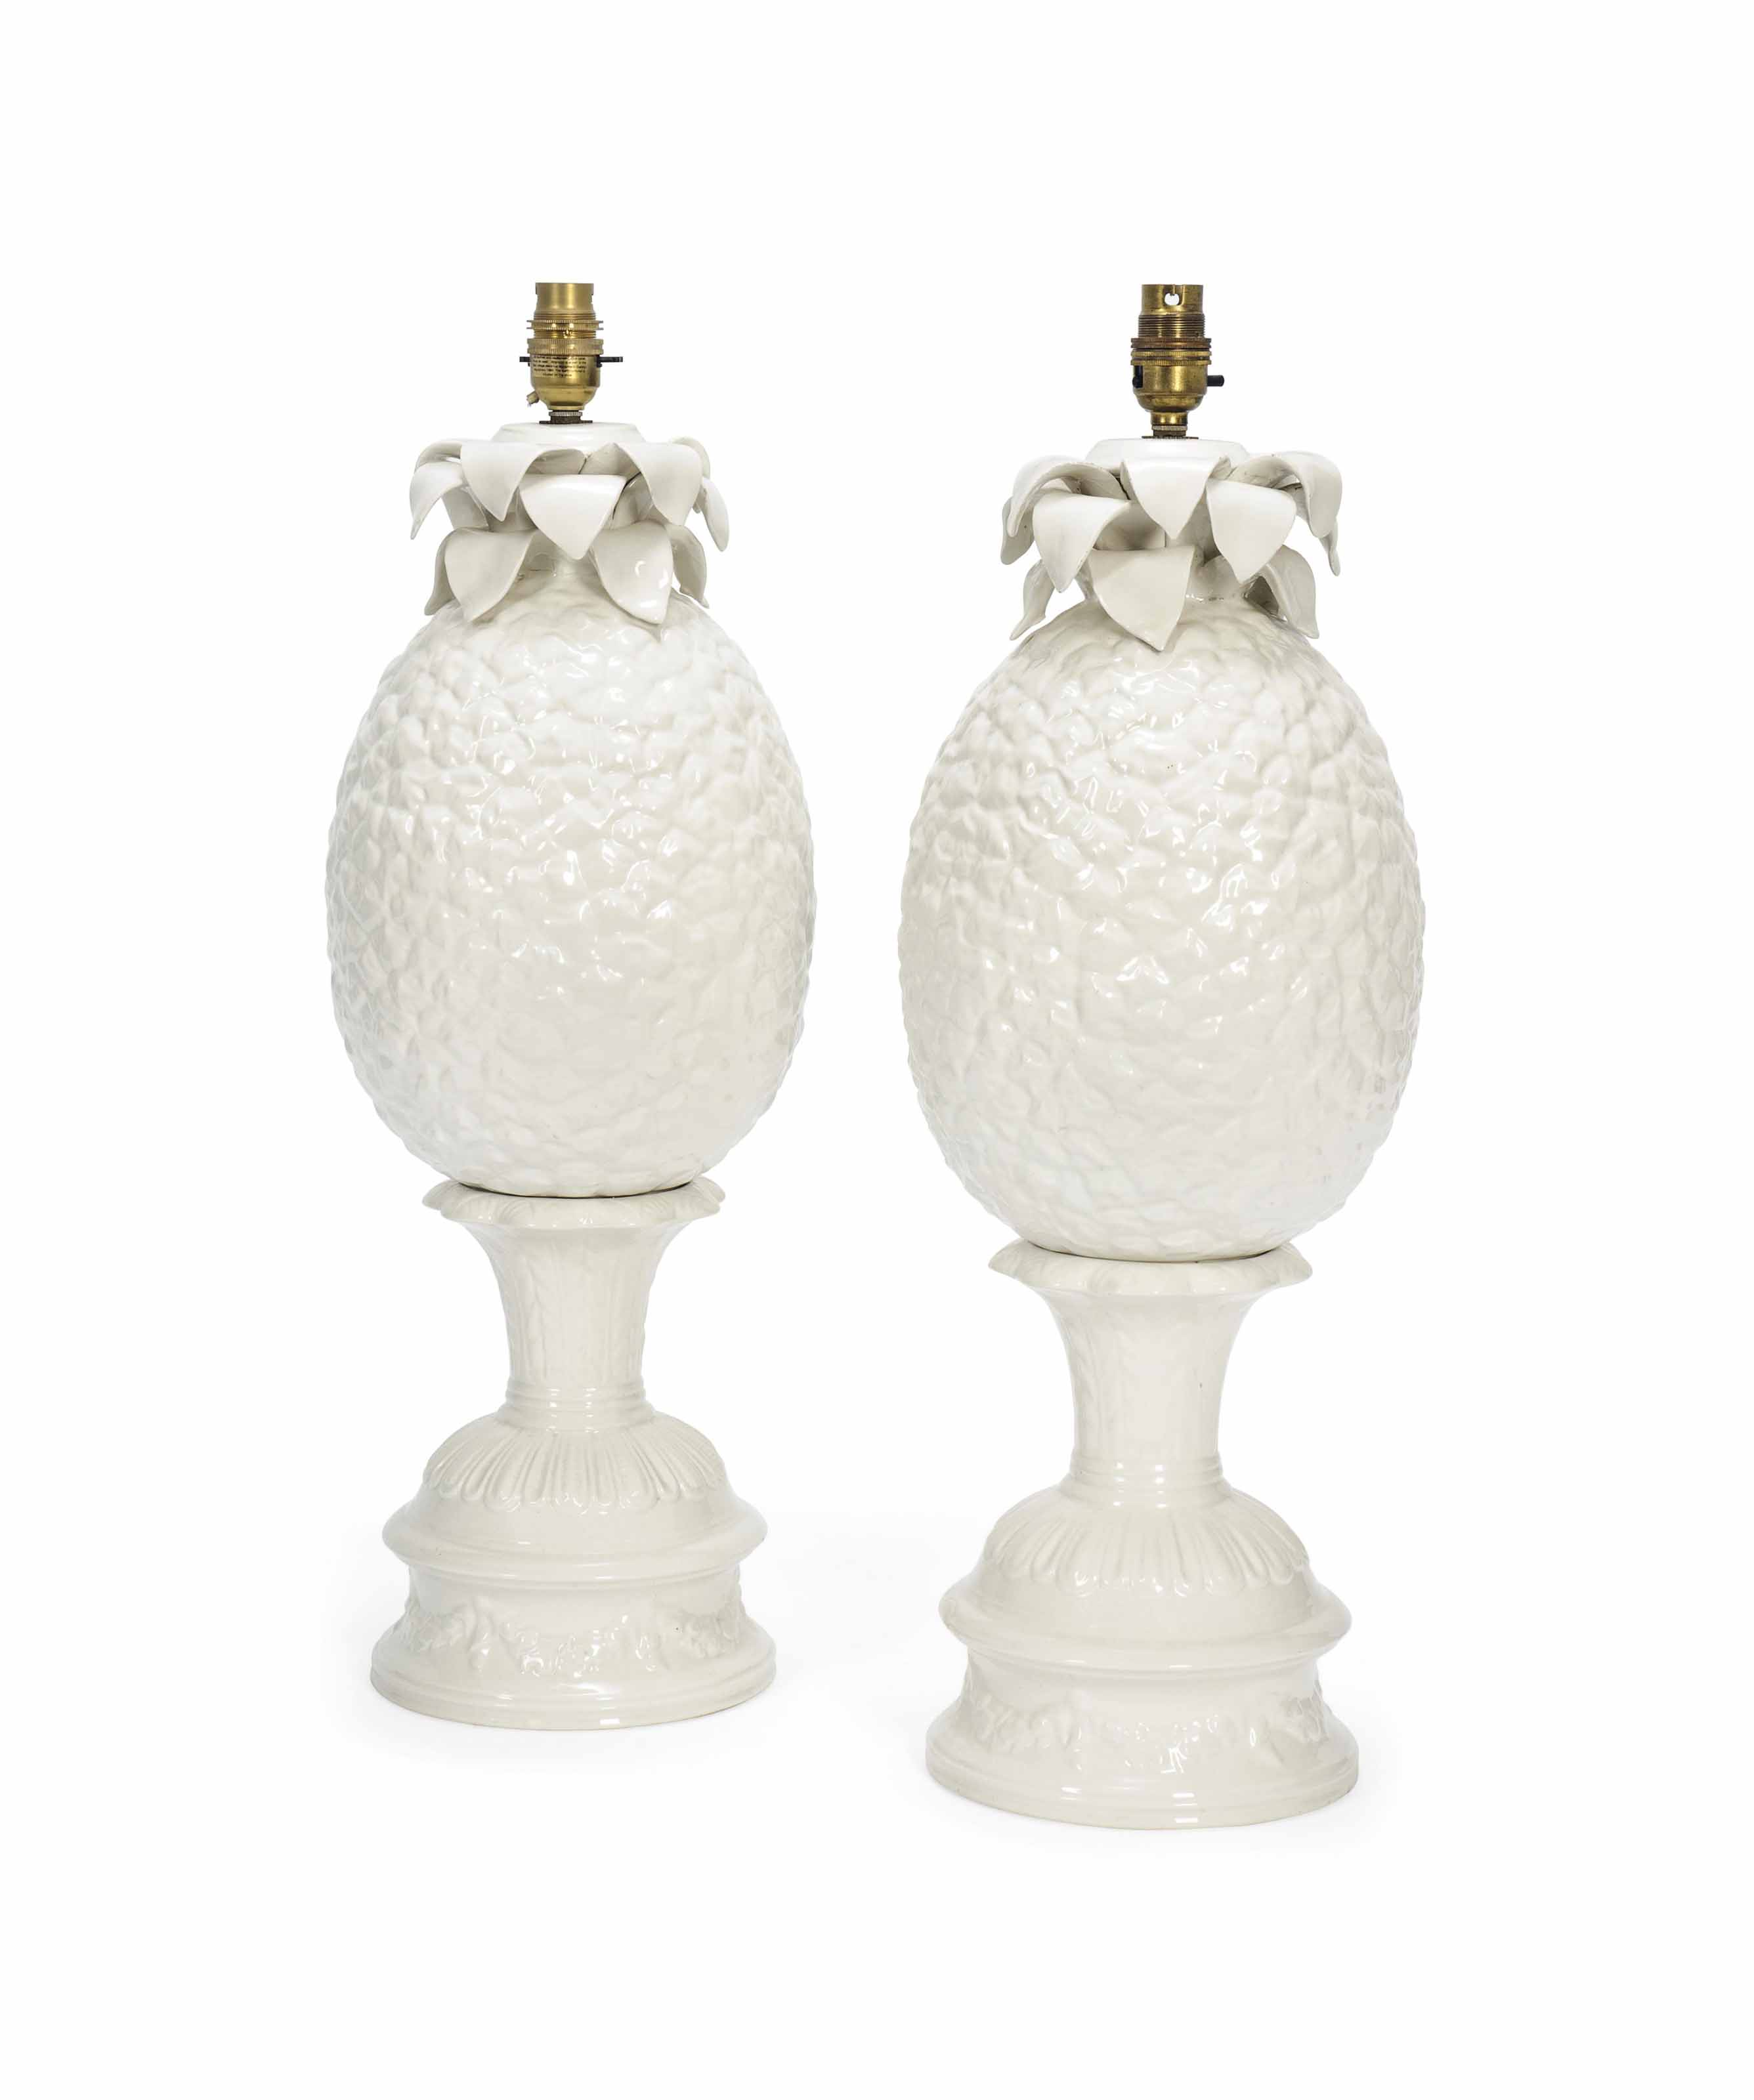 A PAIR OF ITALIAN FAIENCE WHITE-GLAZED LAMP-BASES